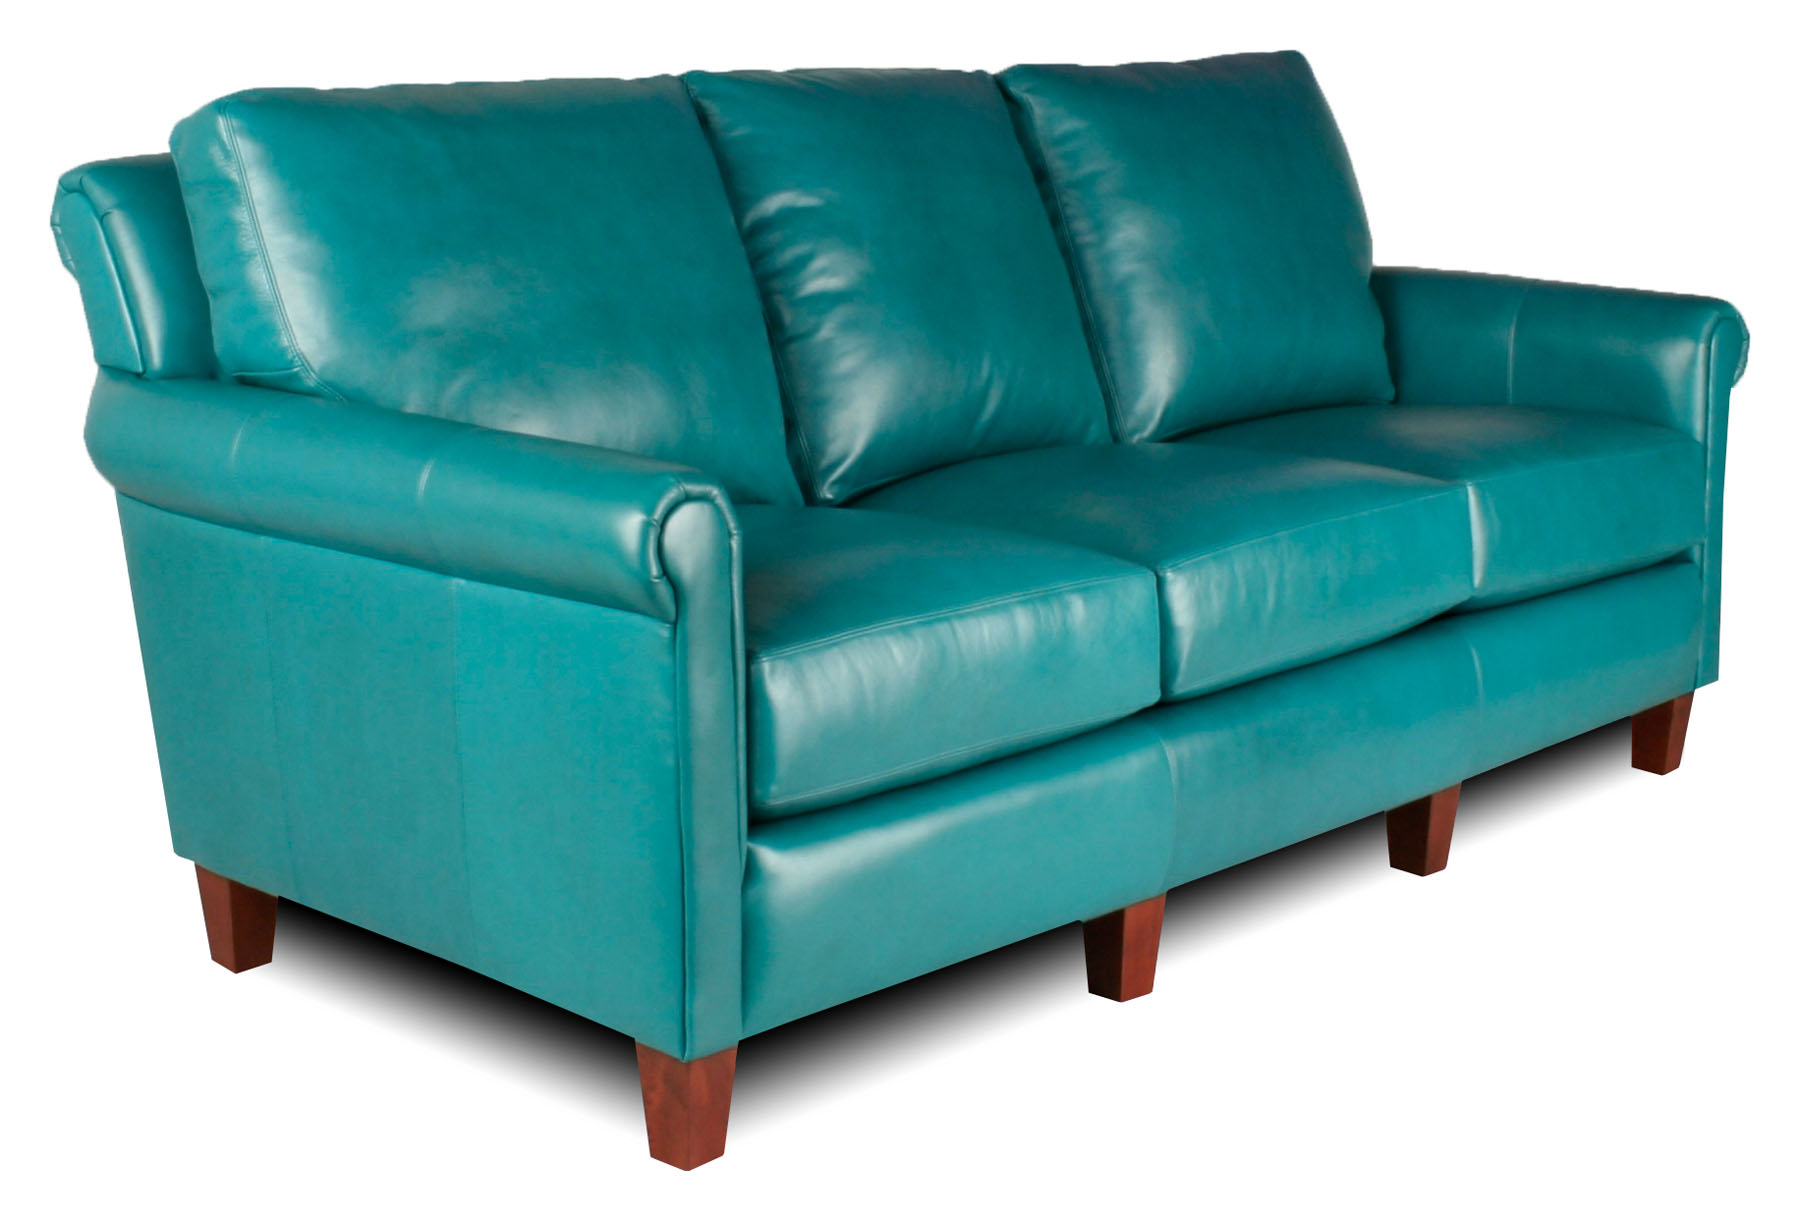 Teal Leather Sofa Teal Leather Sofa Nice As Small